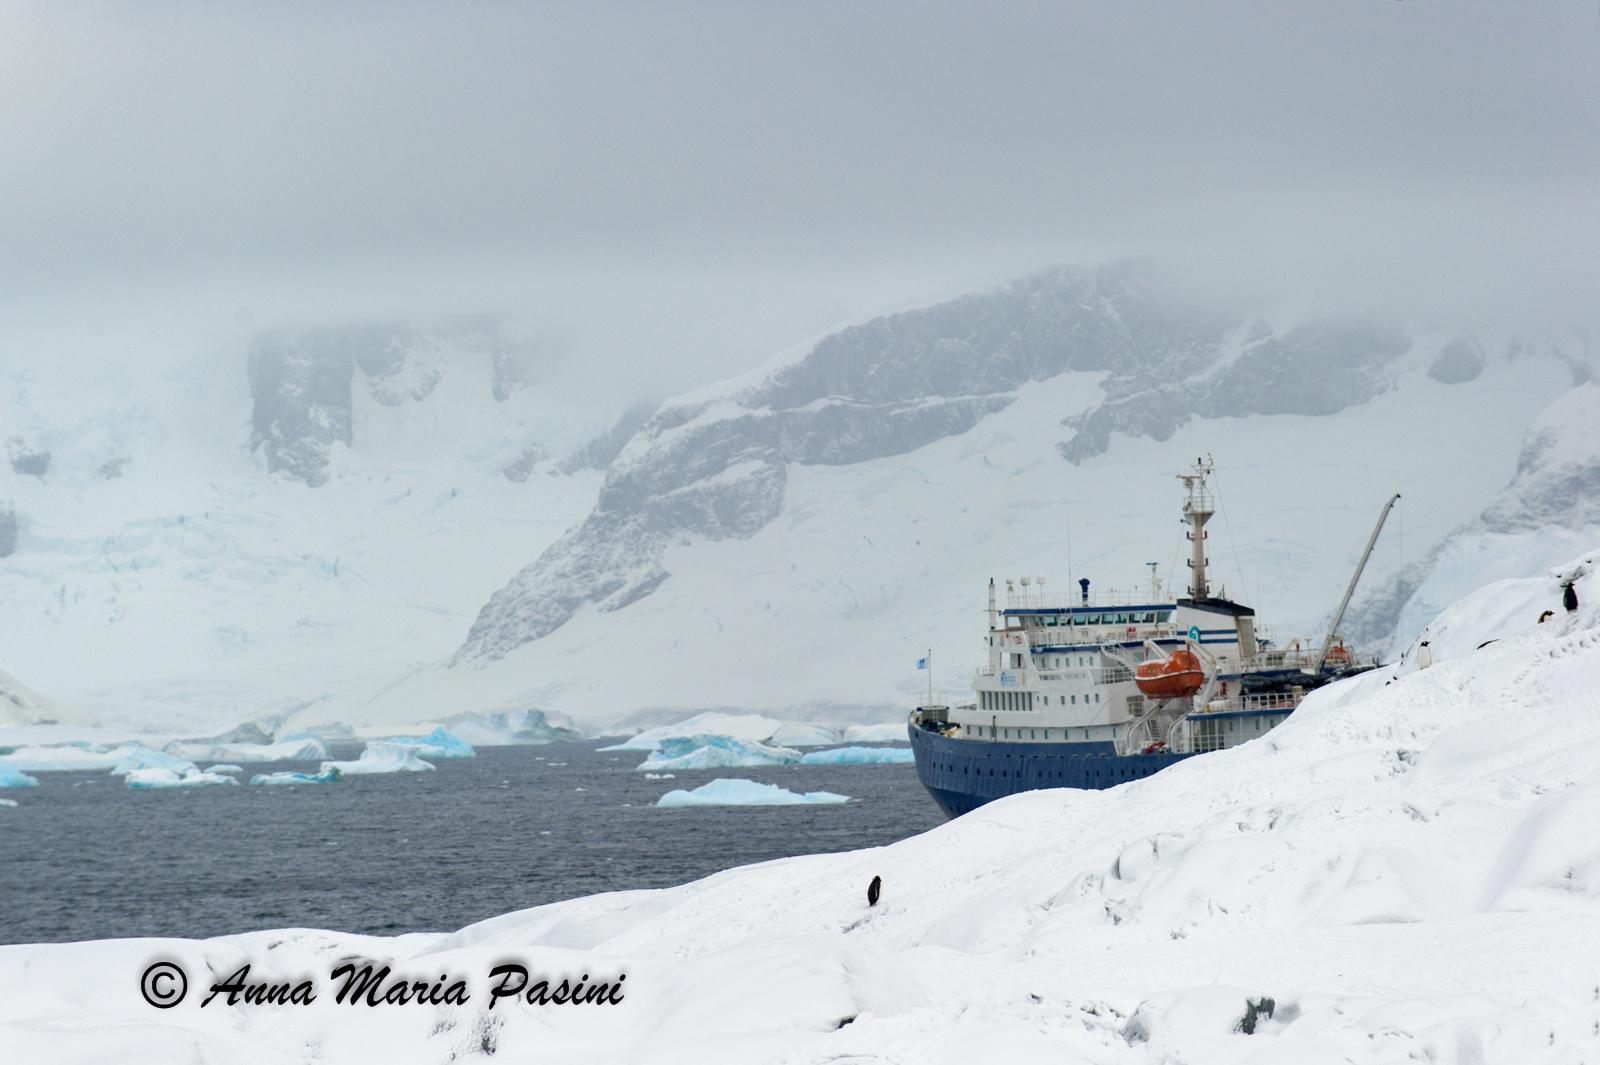 Atmosfera antartica by annamariapasini